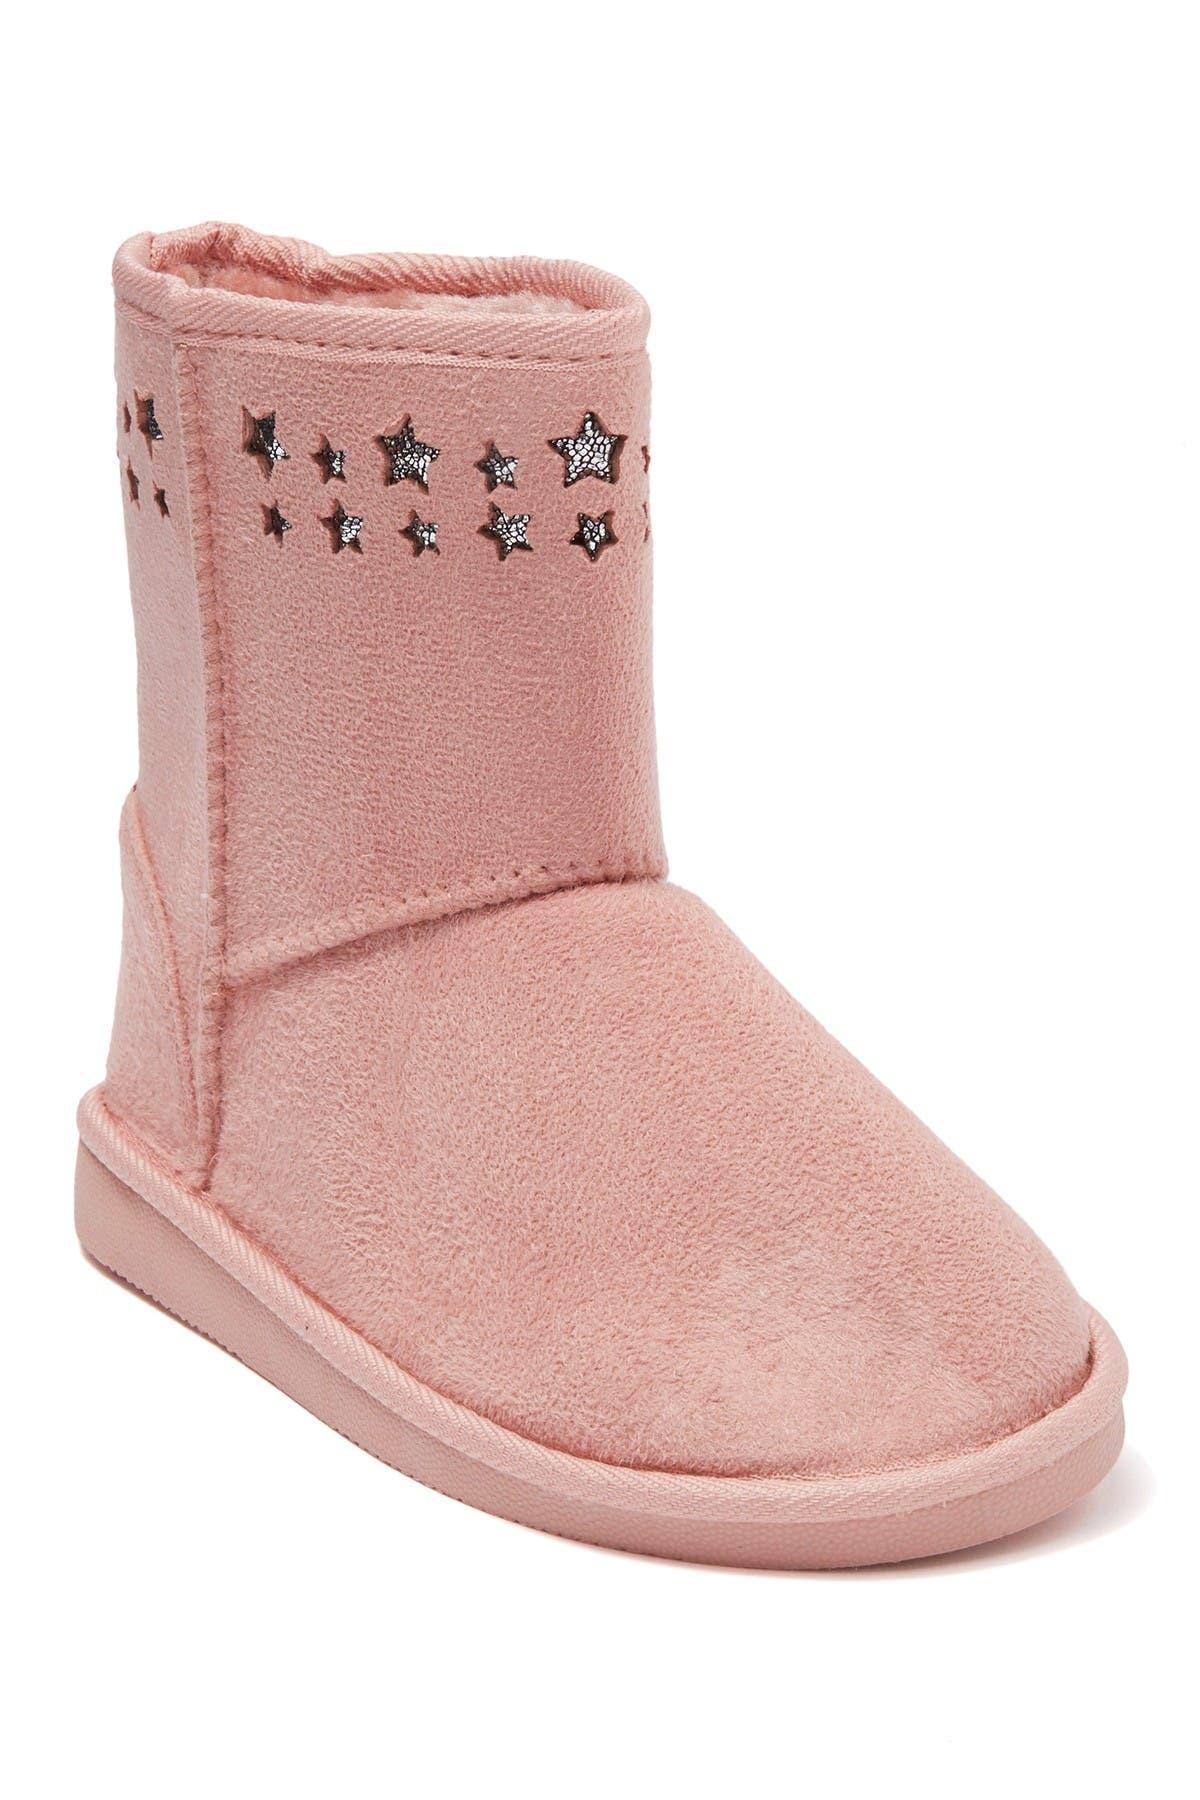 Bebe Star Faux Fur Lined Microsuede Winter Boot